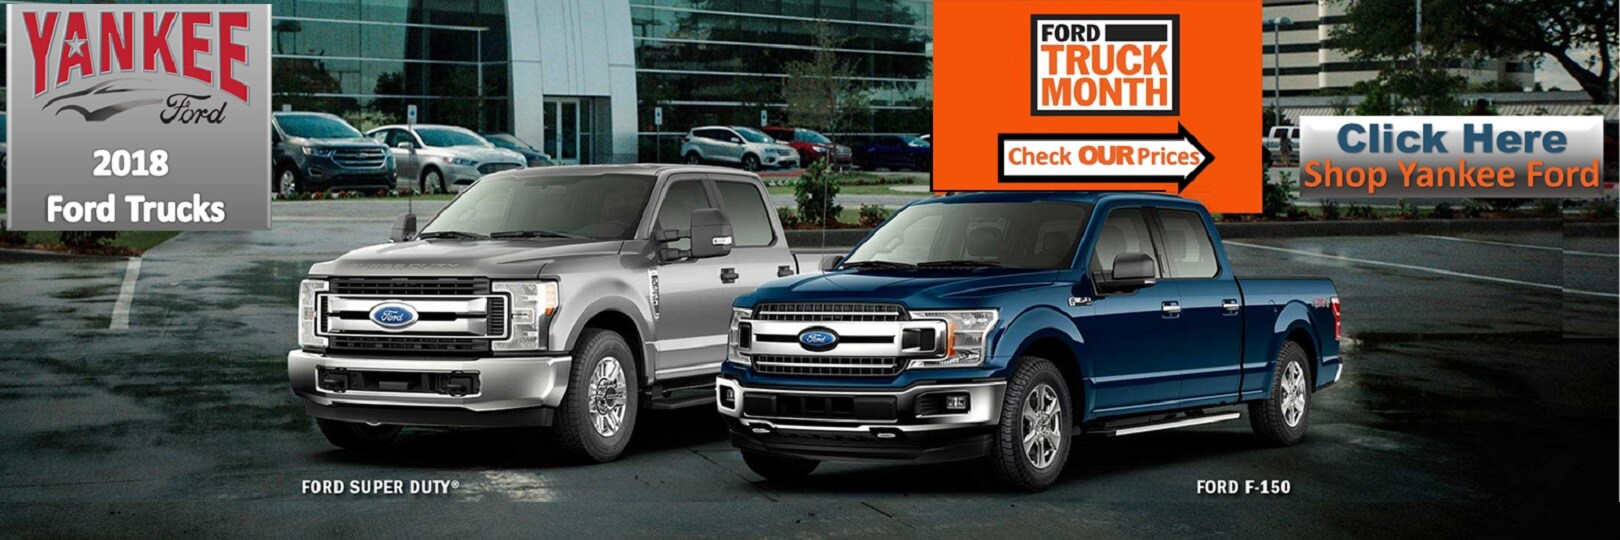 Honda Dealership Portland >> Yankee Ford | Ford Dealership in South Portland ME